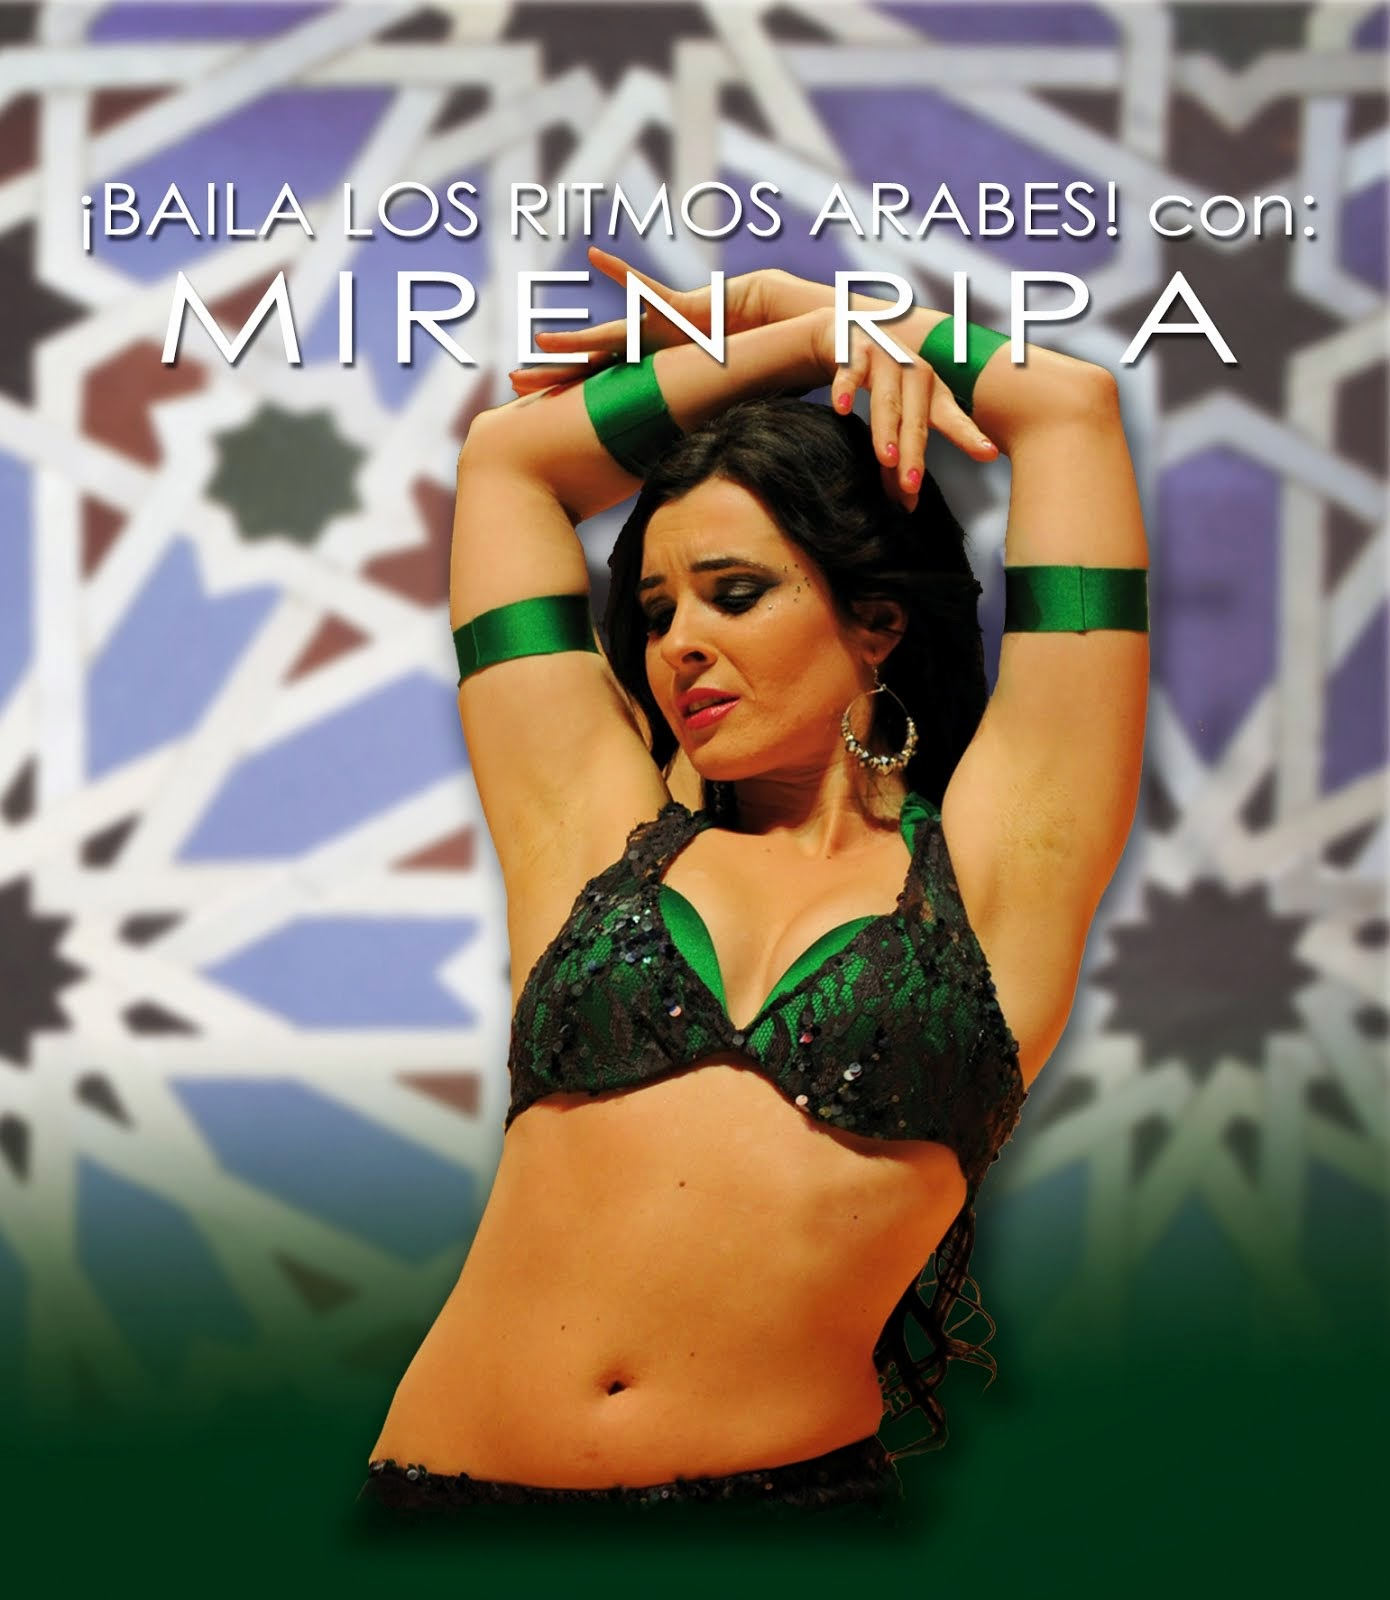 Baila Los Ritmos Arabes con Miren Ripa.